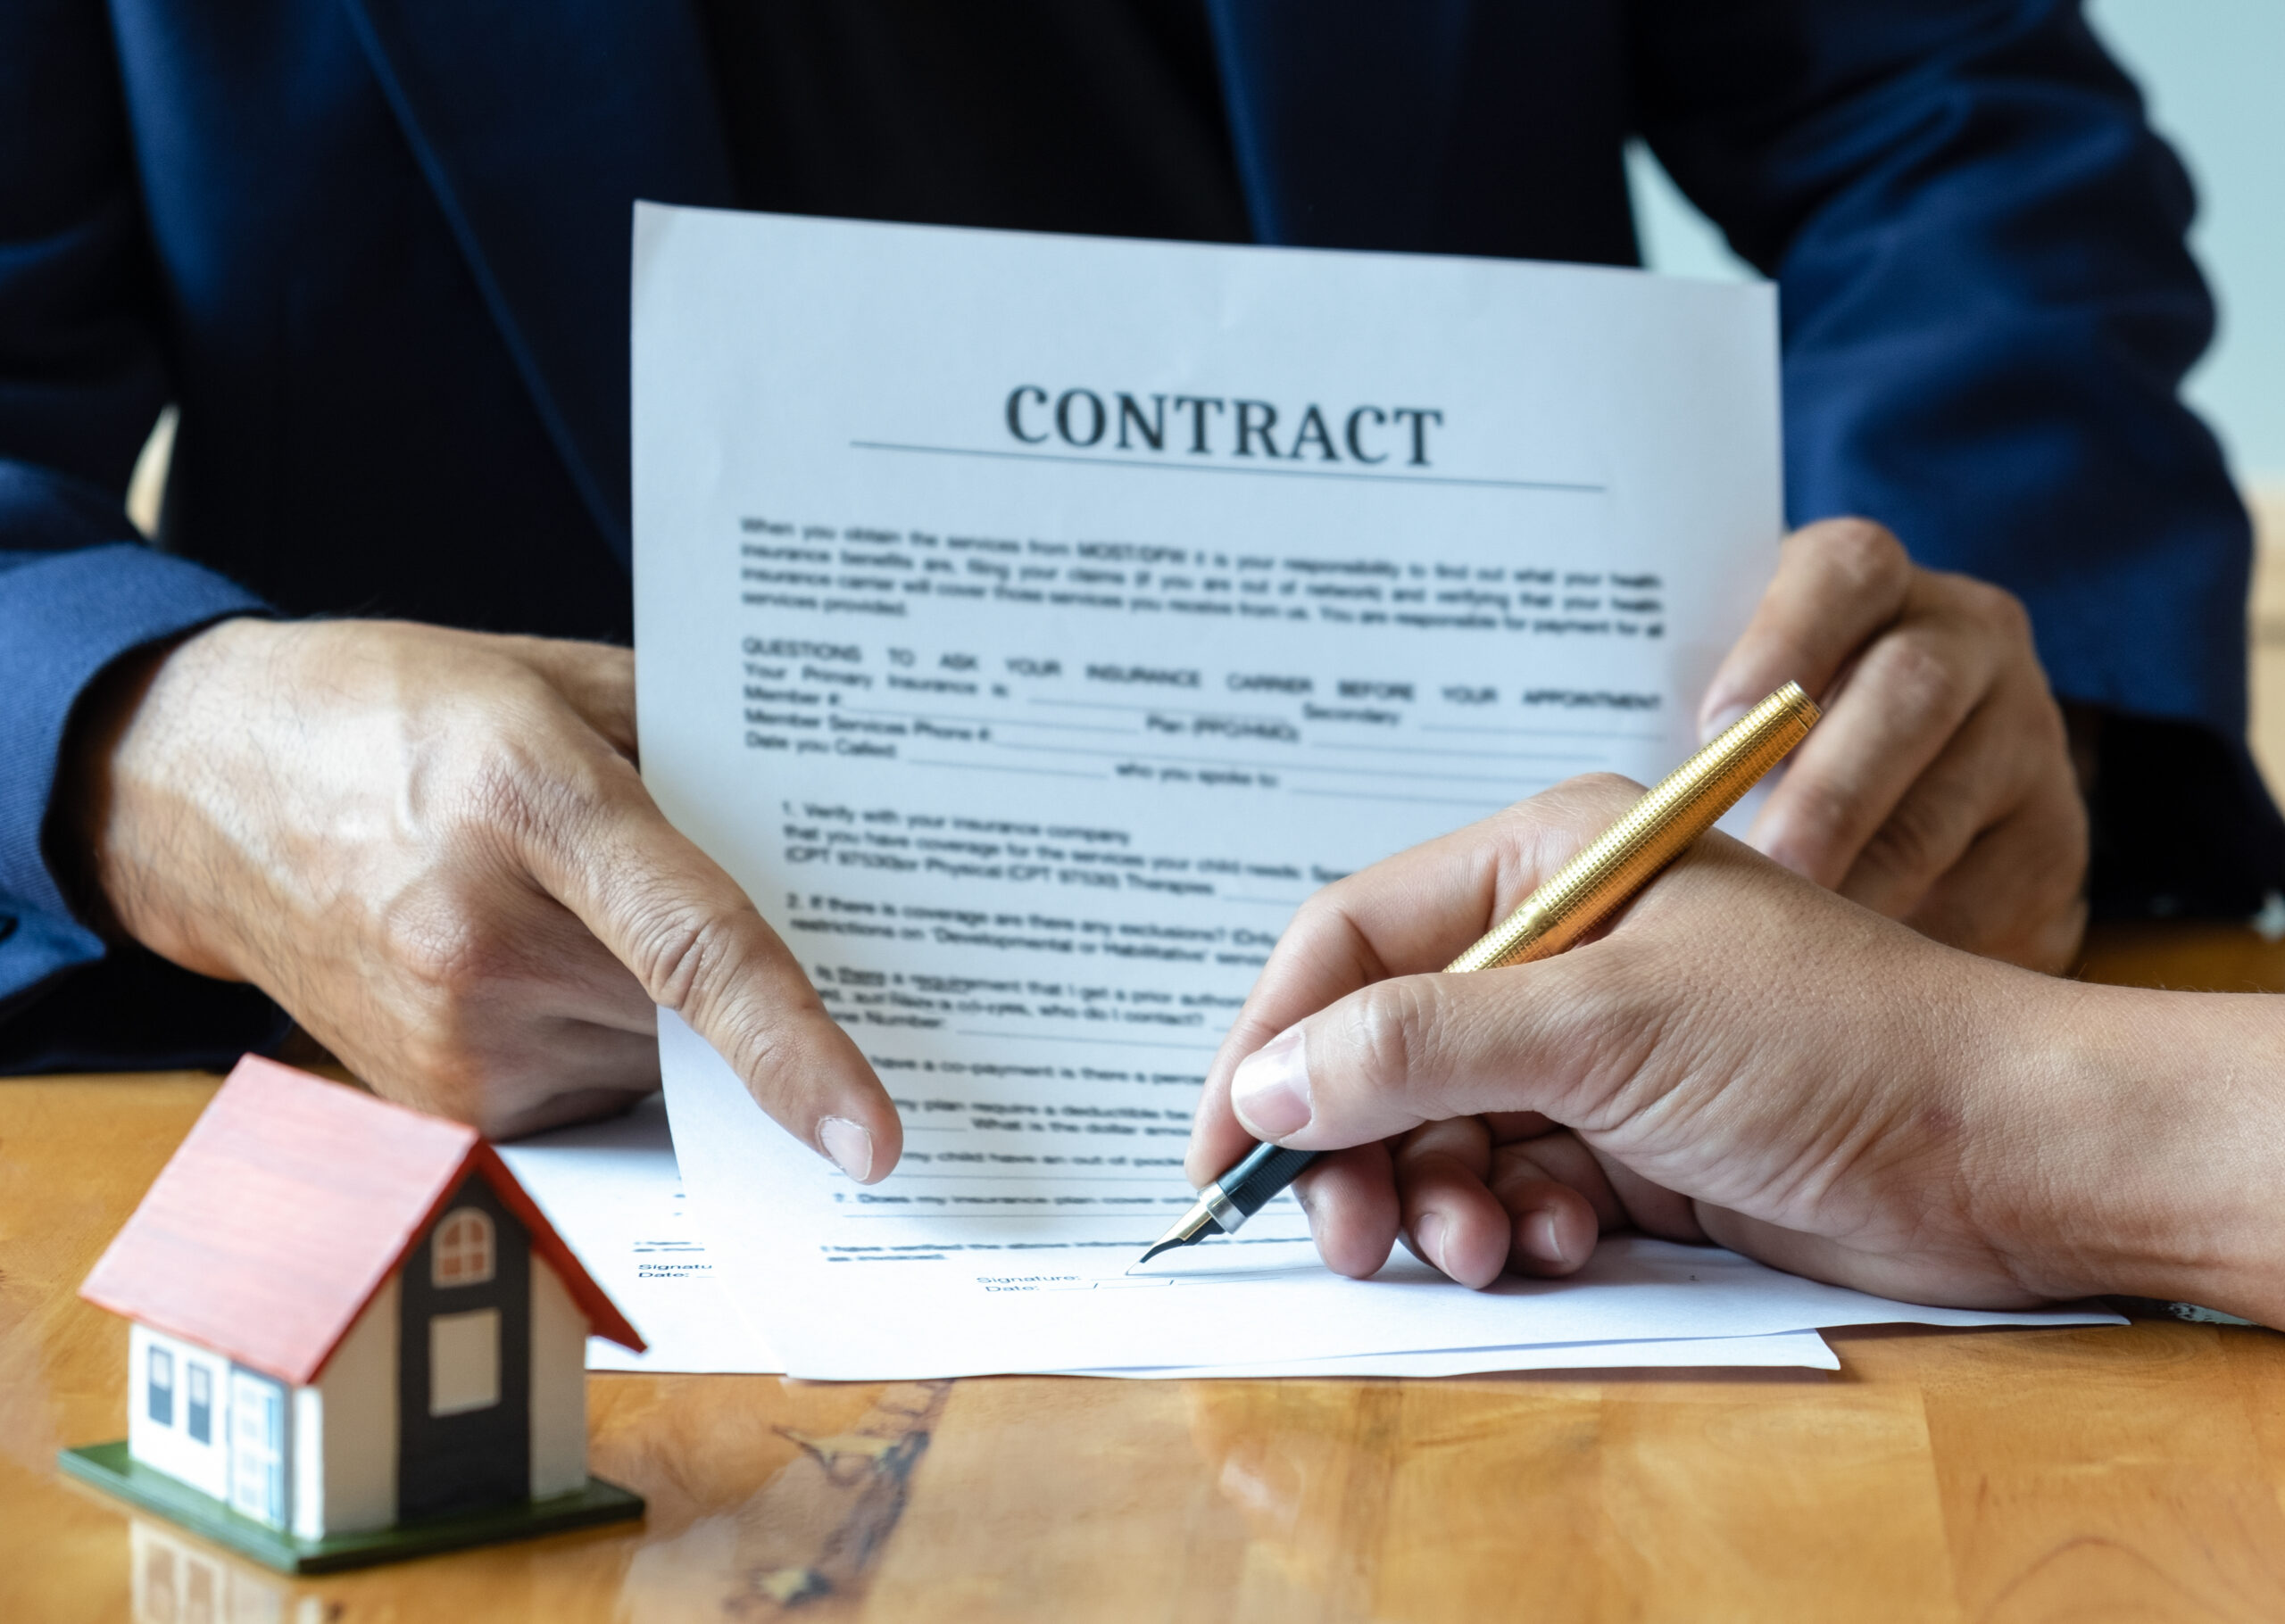 pessoa assinando contrato